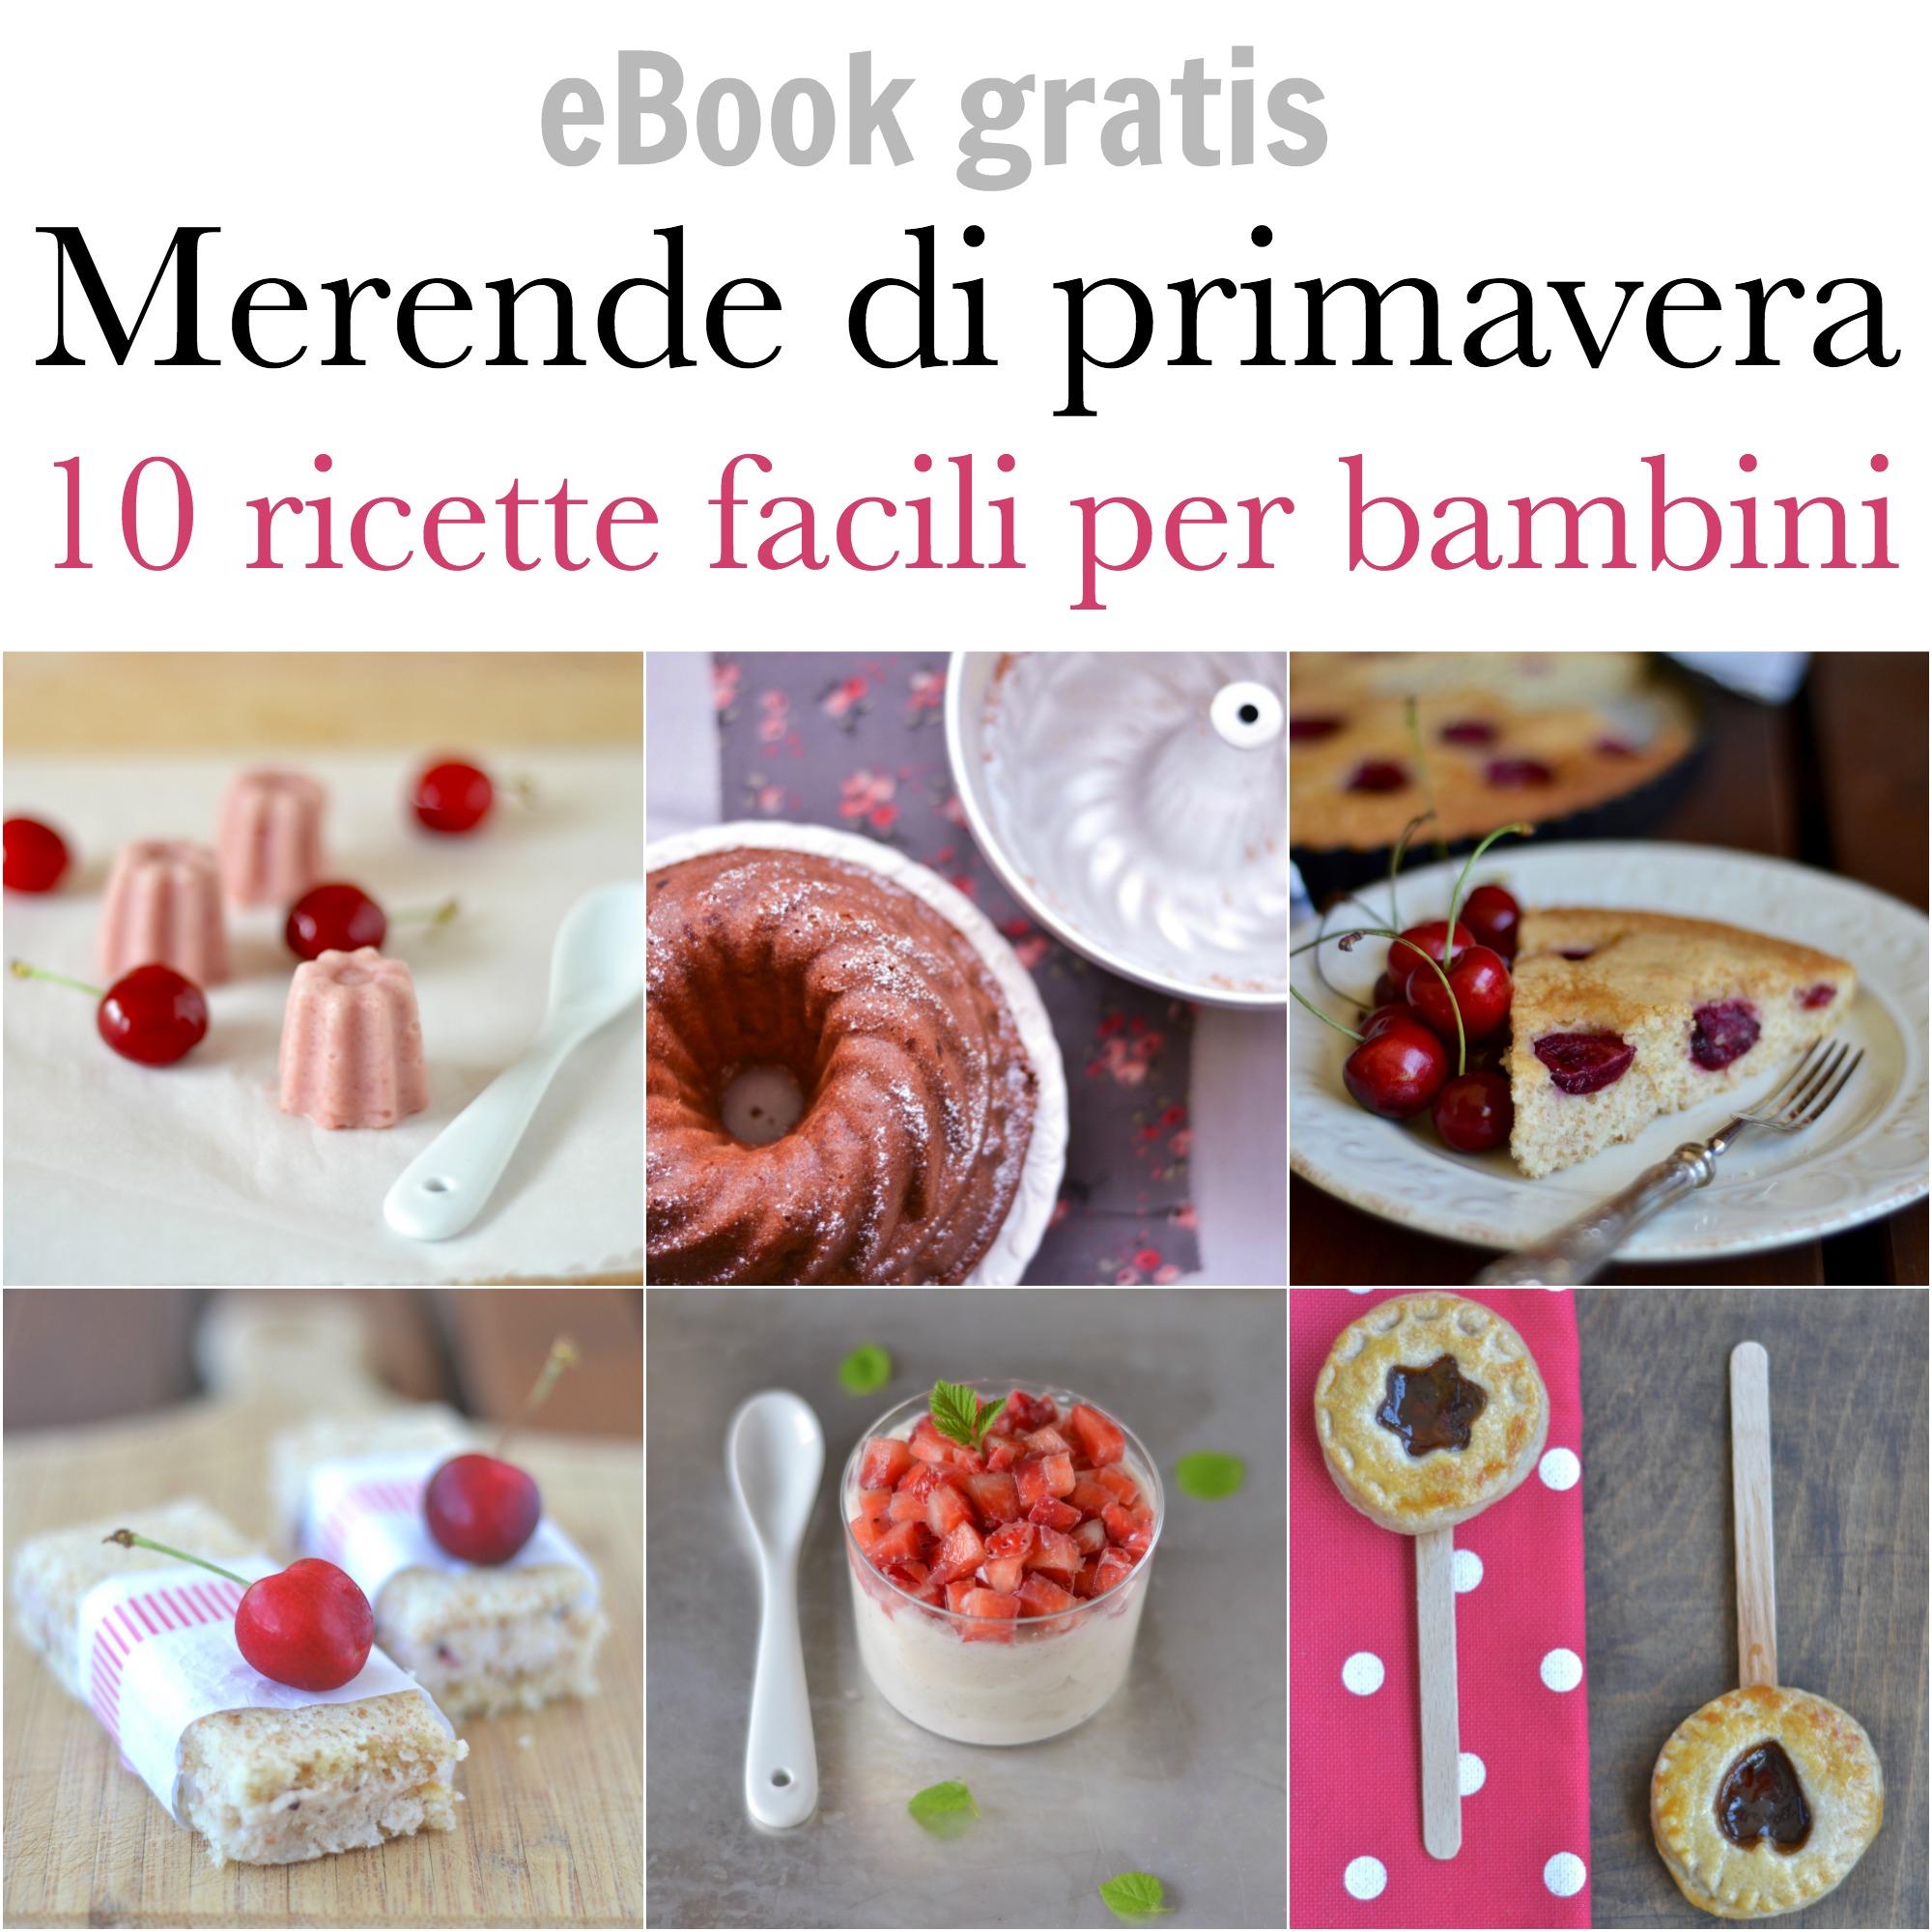 Ebook gratis merende per bambini 10 ricette per la for Ricette bambini